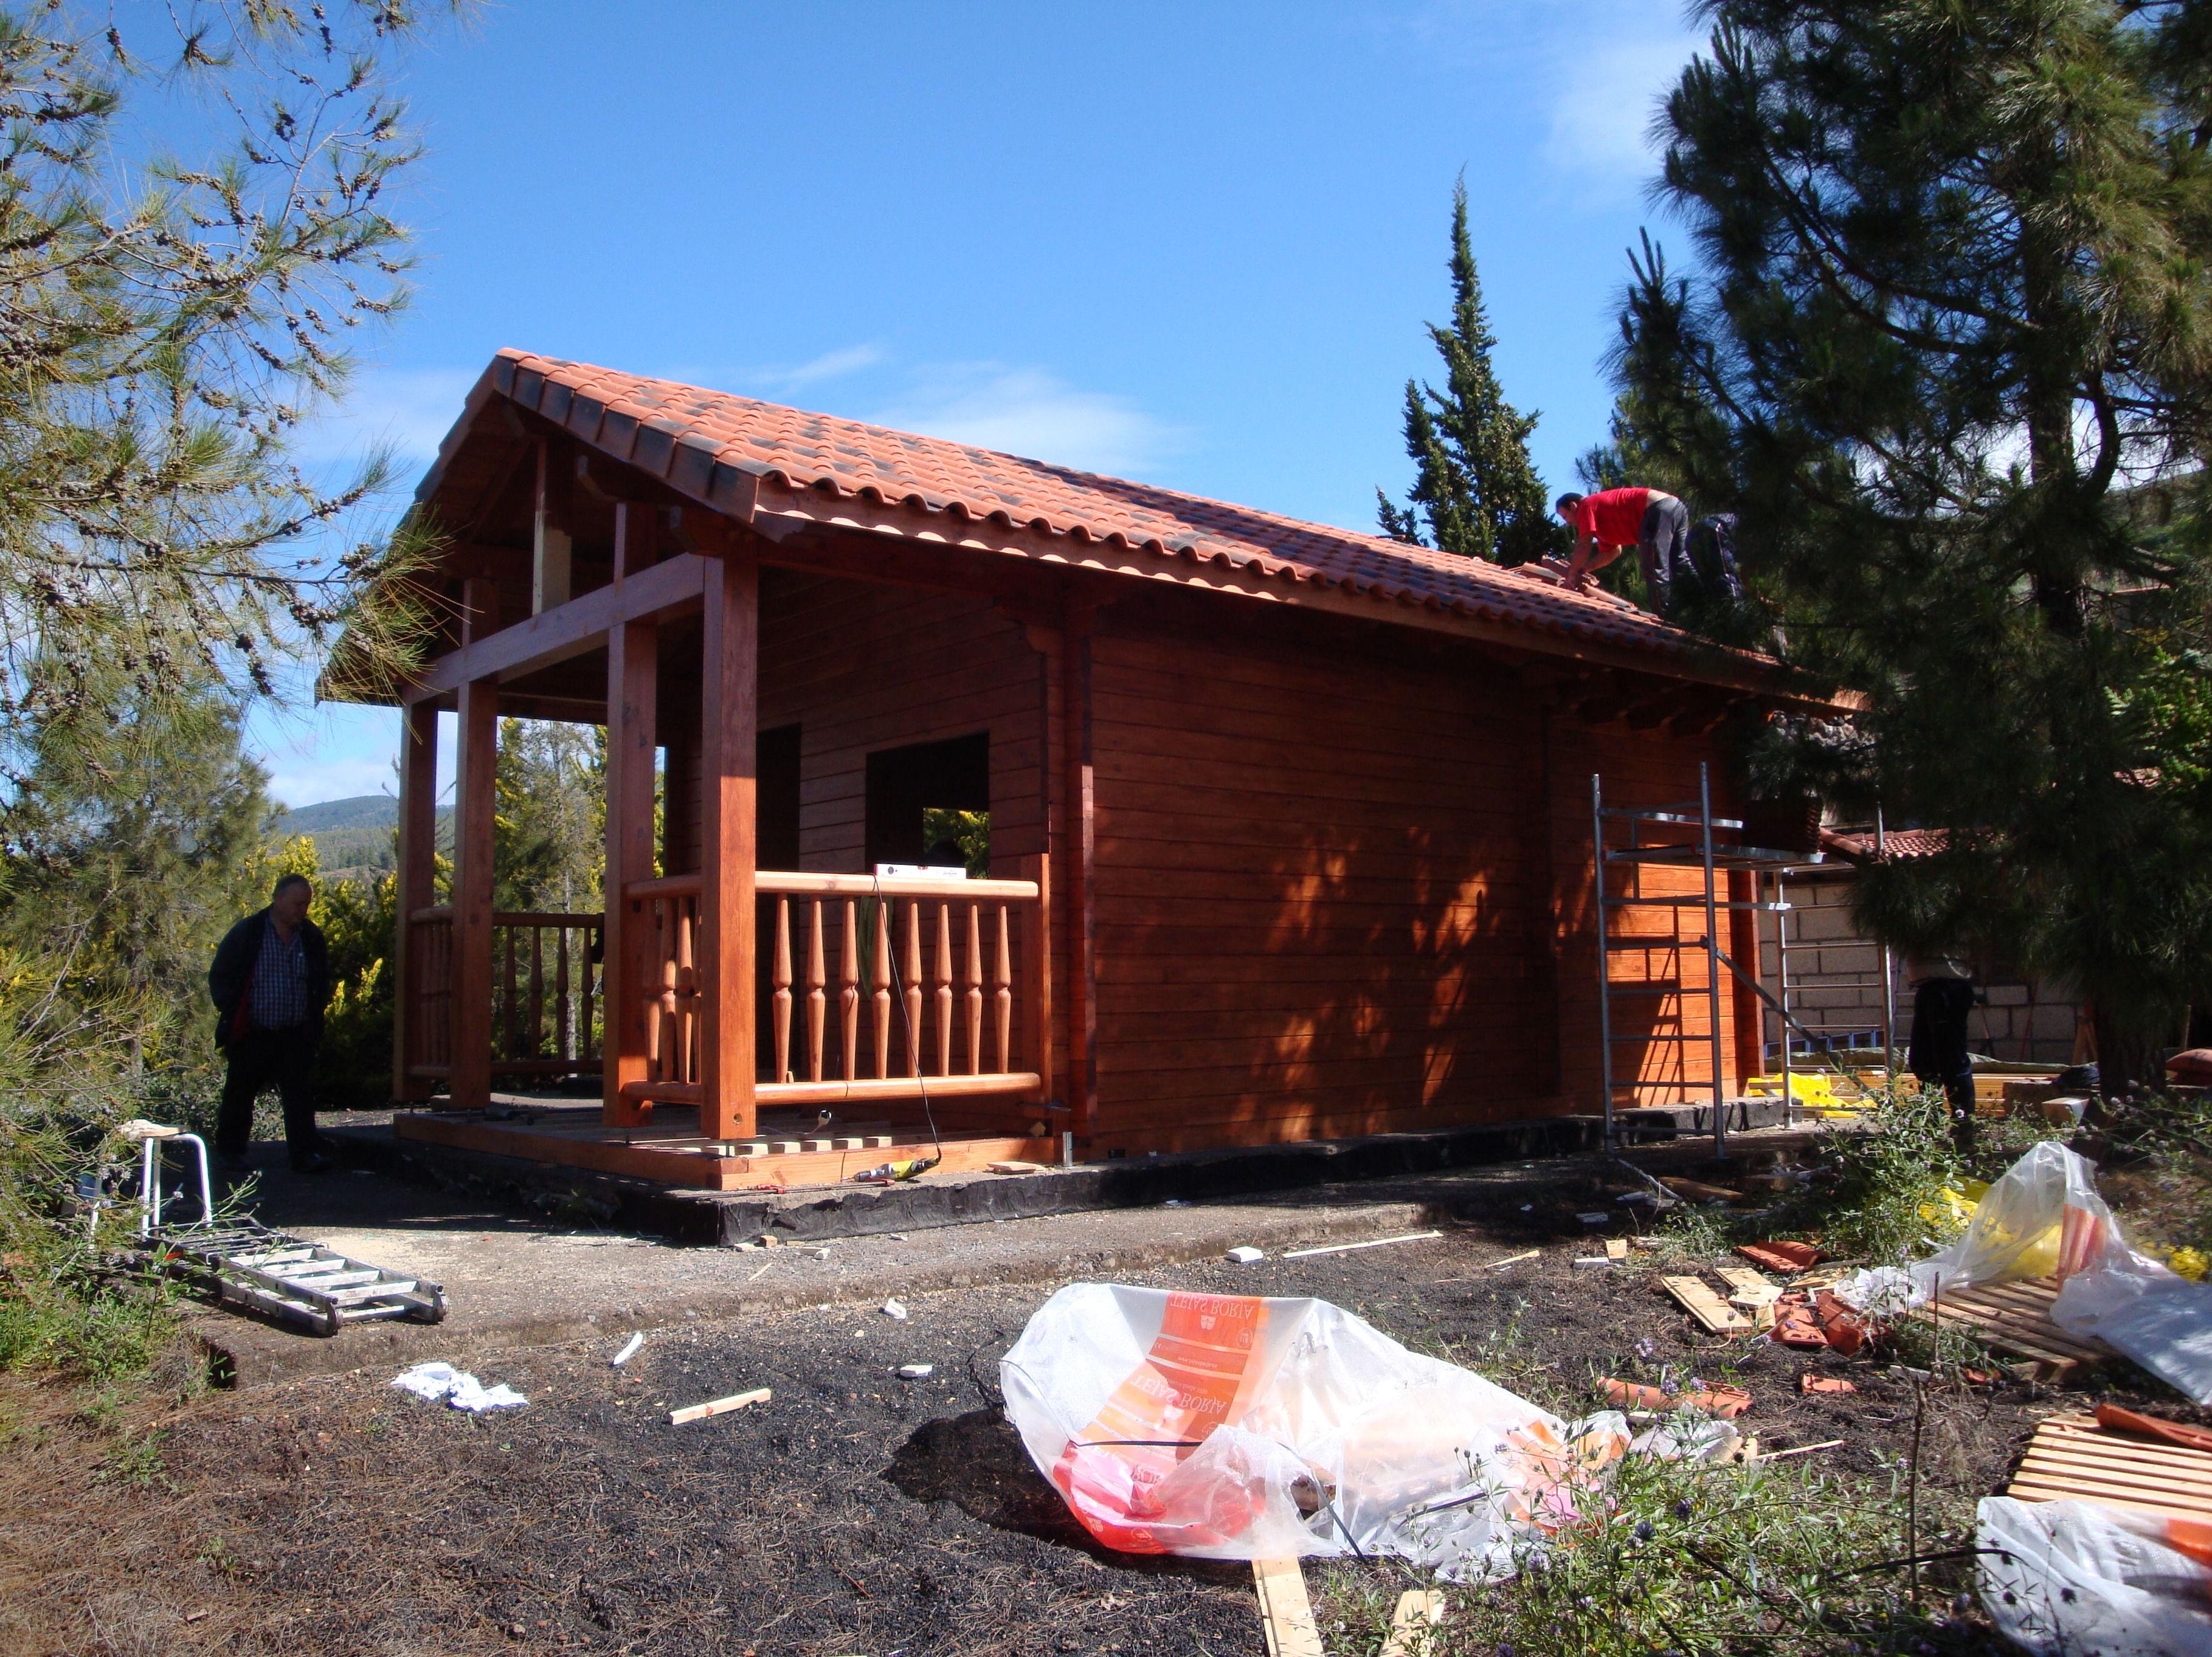 Cabaña madera Tenerife wood cabin